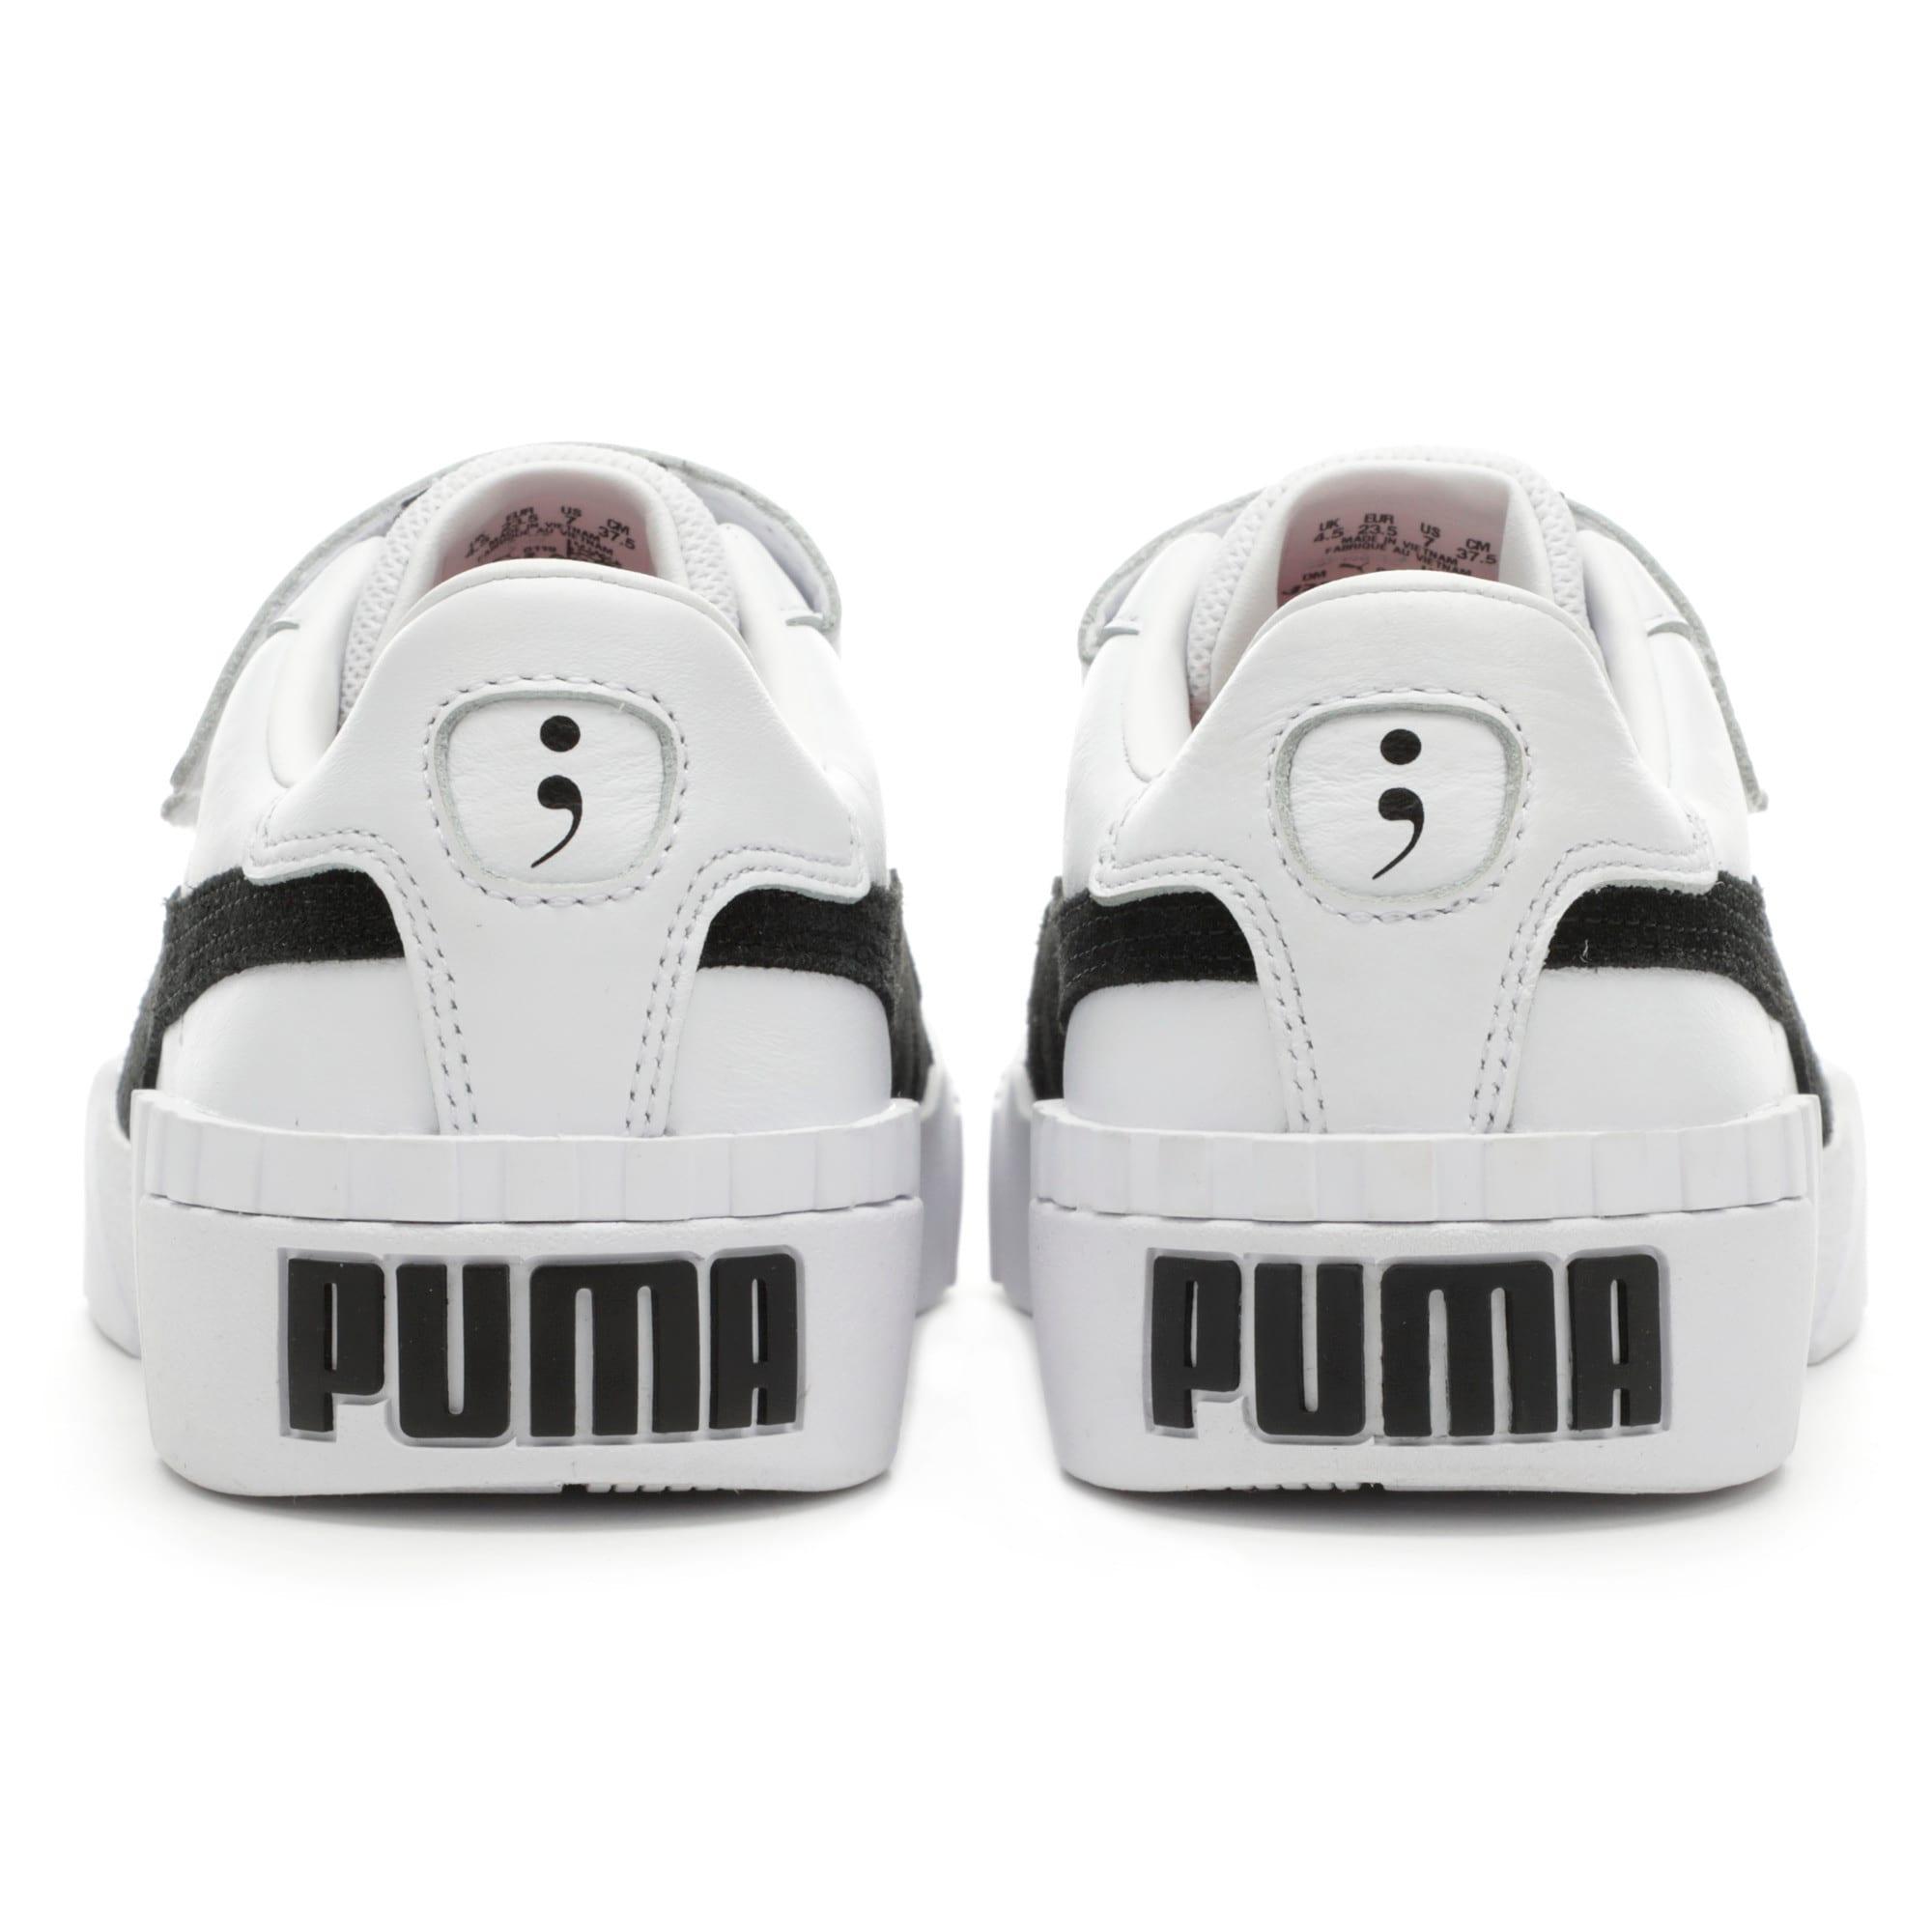 Thumbnail 4 of PUMA x SELENA GOMEZ Cali Women's Trainers, Puma White-Puma Black, medium